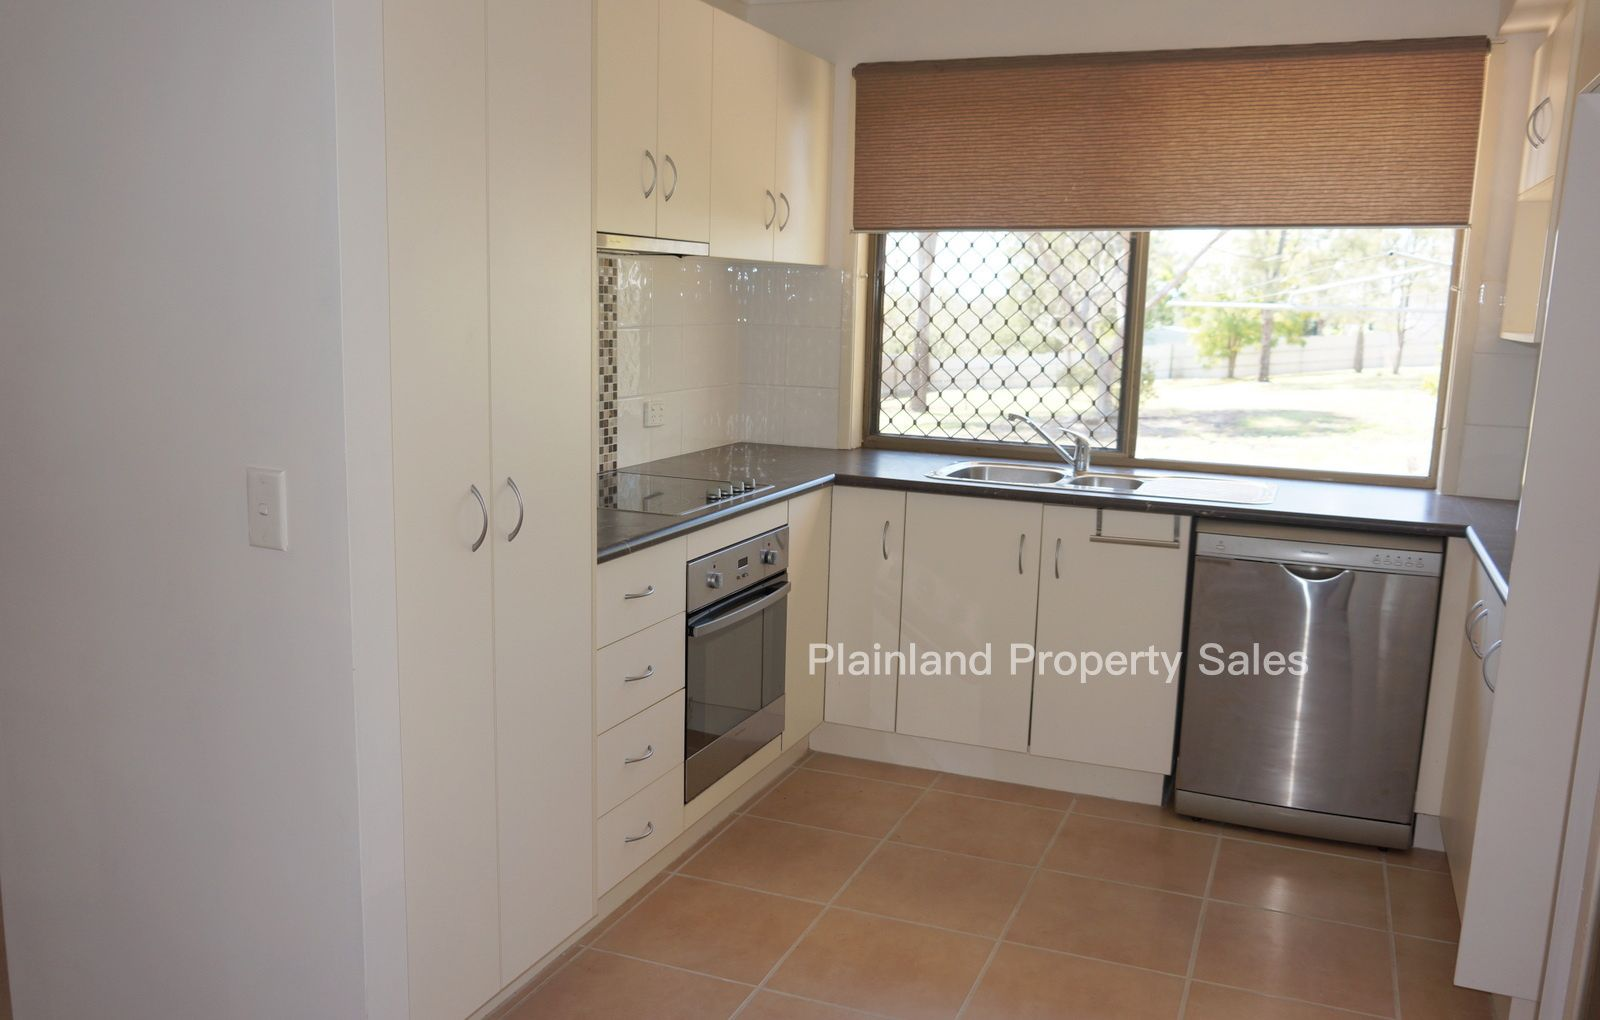 Glenore Grove QLD 4342, Image 2